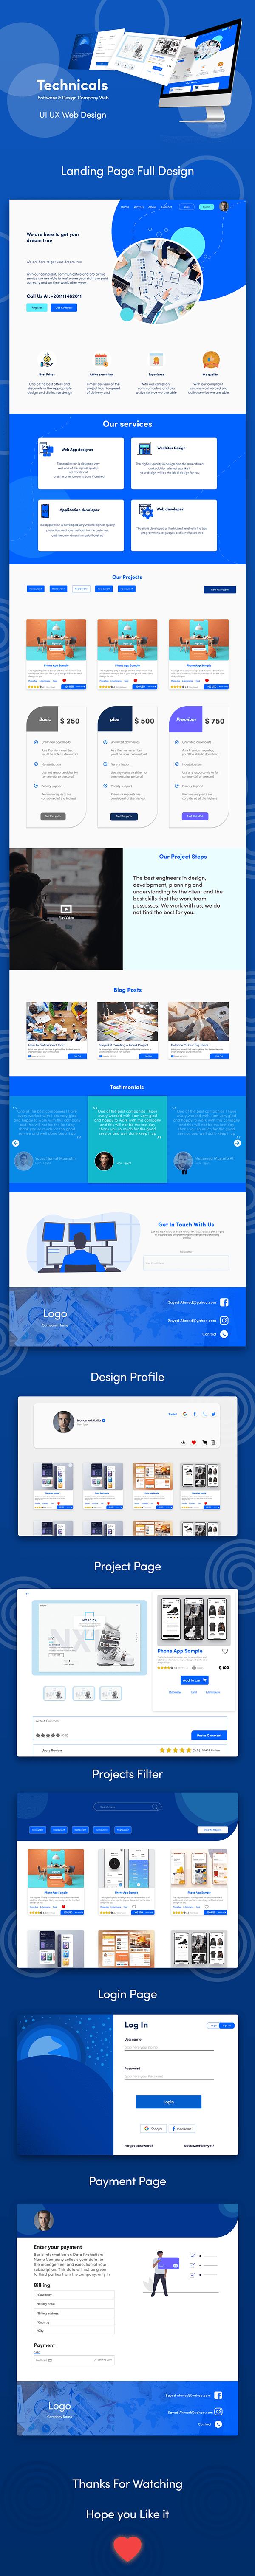 Technicals Company | UI UX Web Design